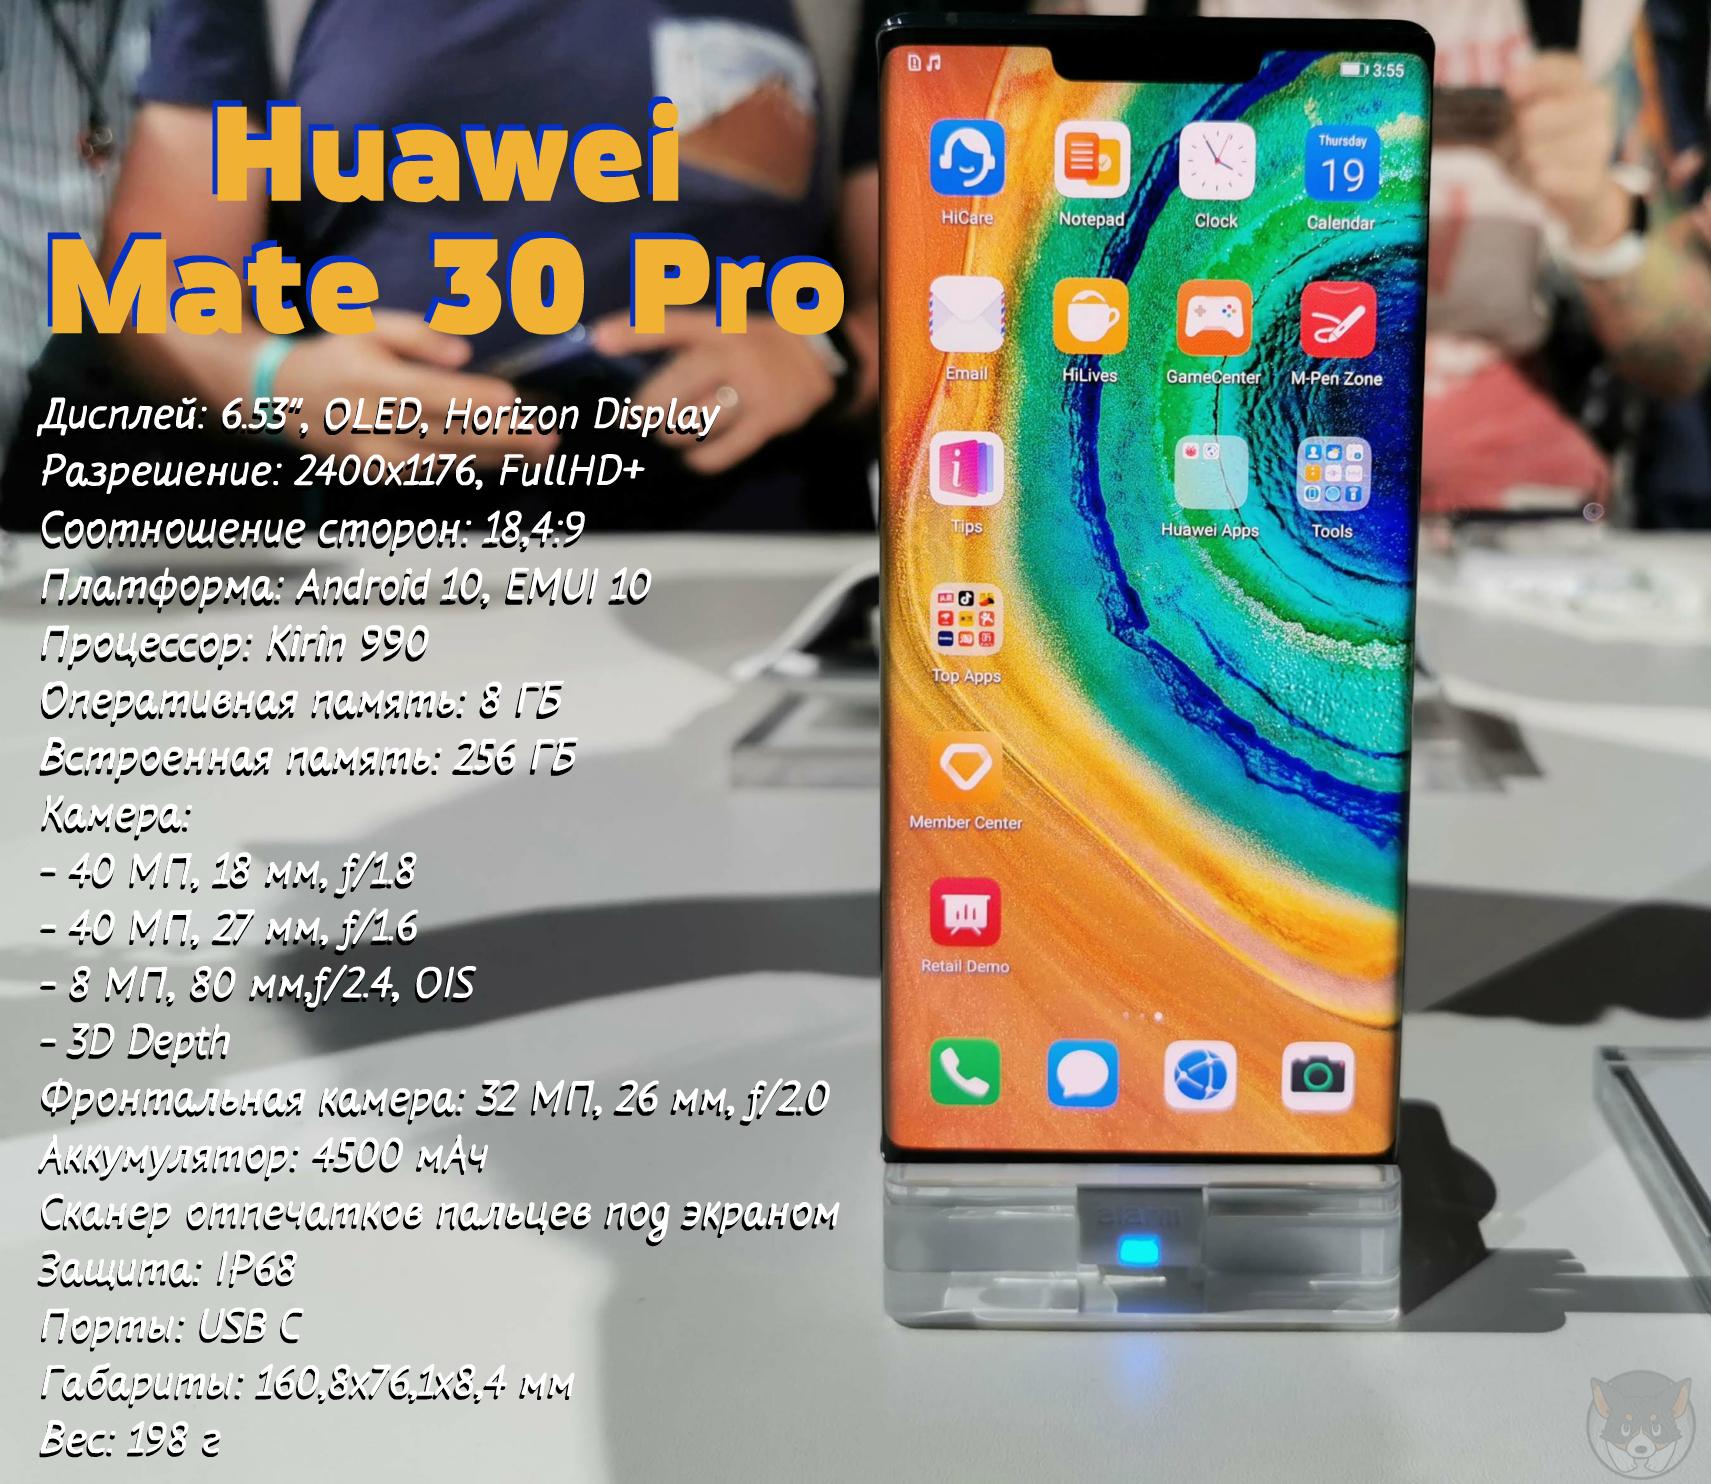 характеристики Huawei Mate 30 Pro